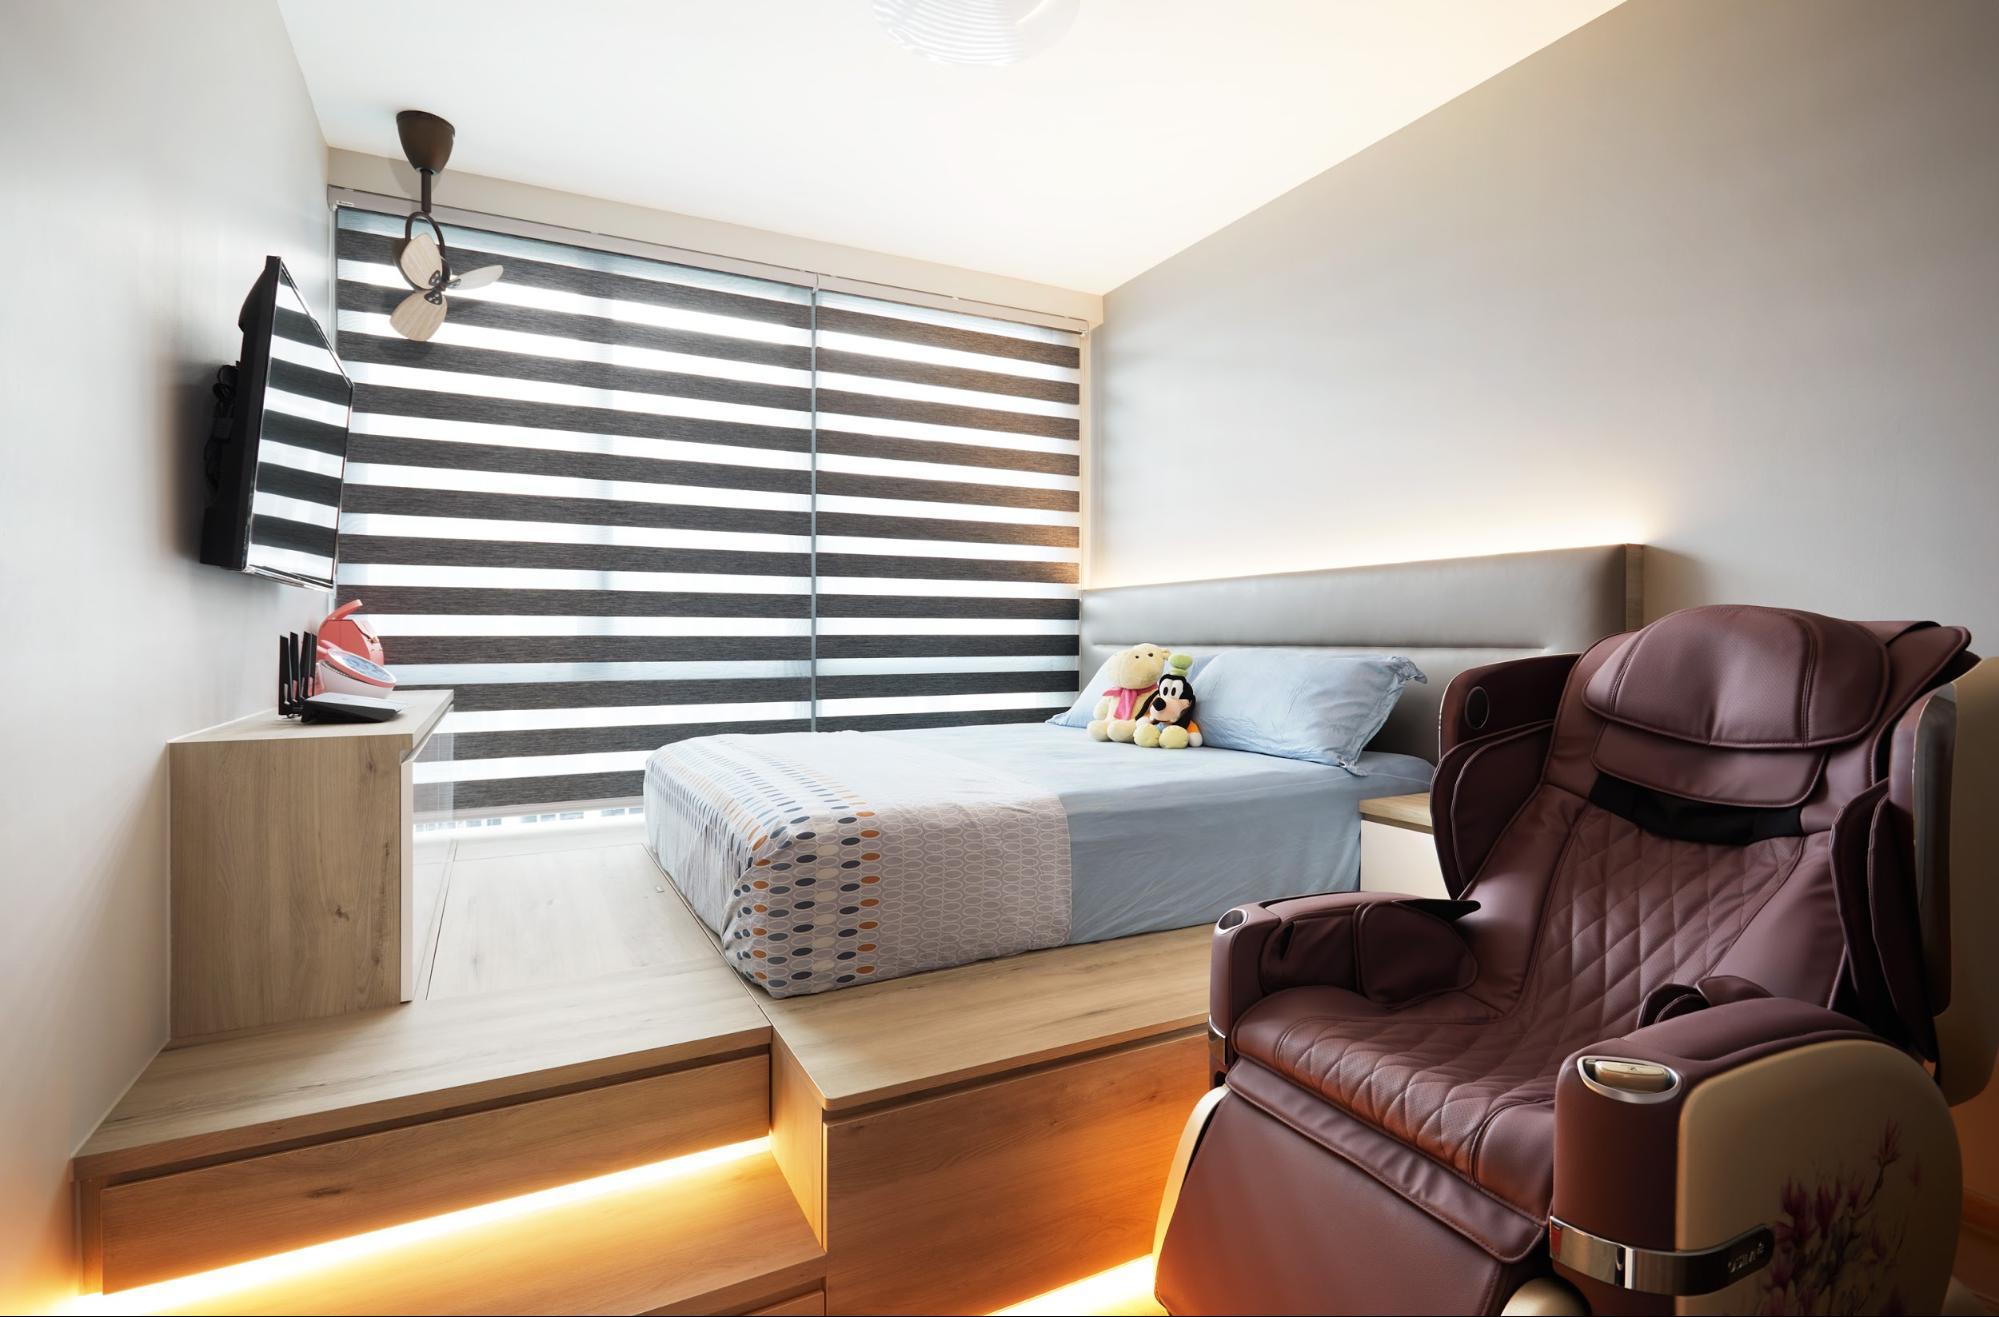 hdb renovation - platform bed